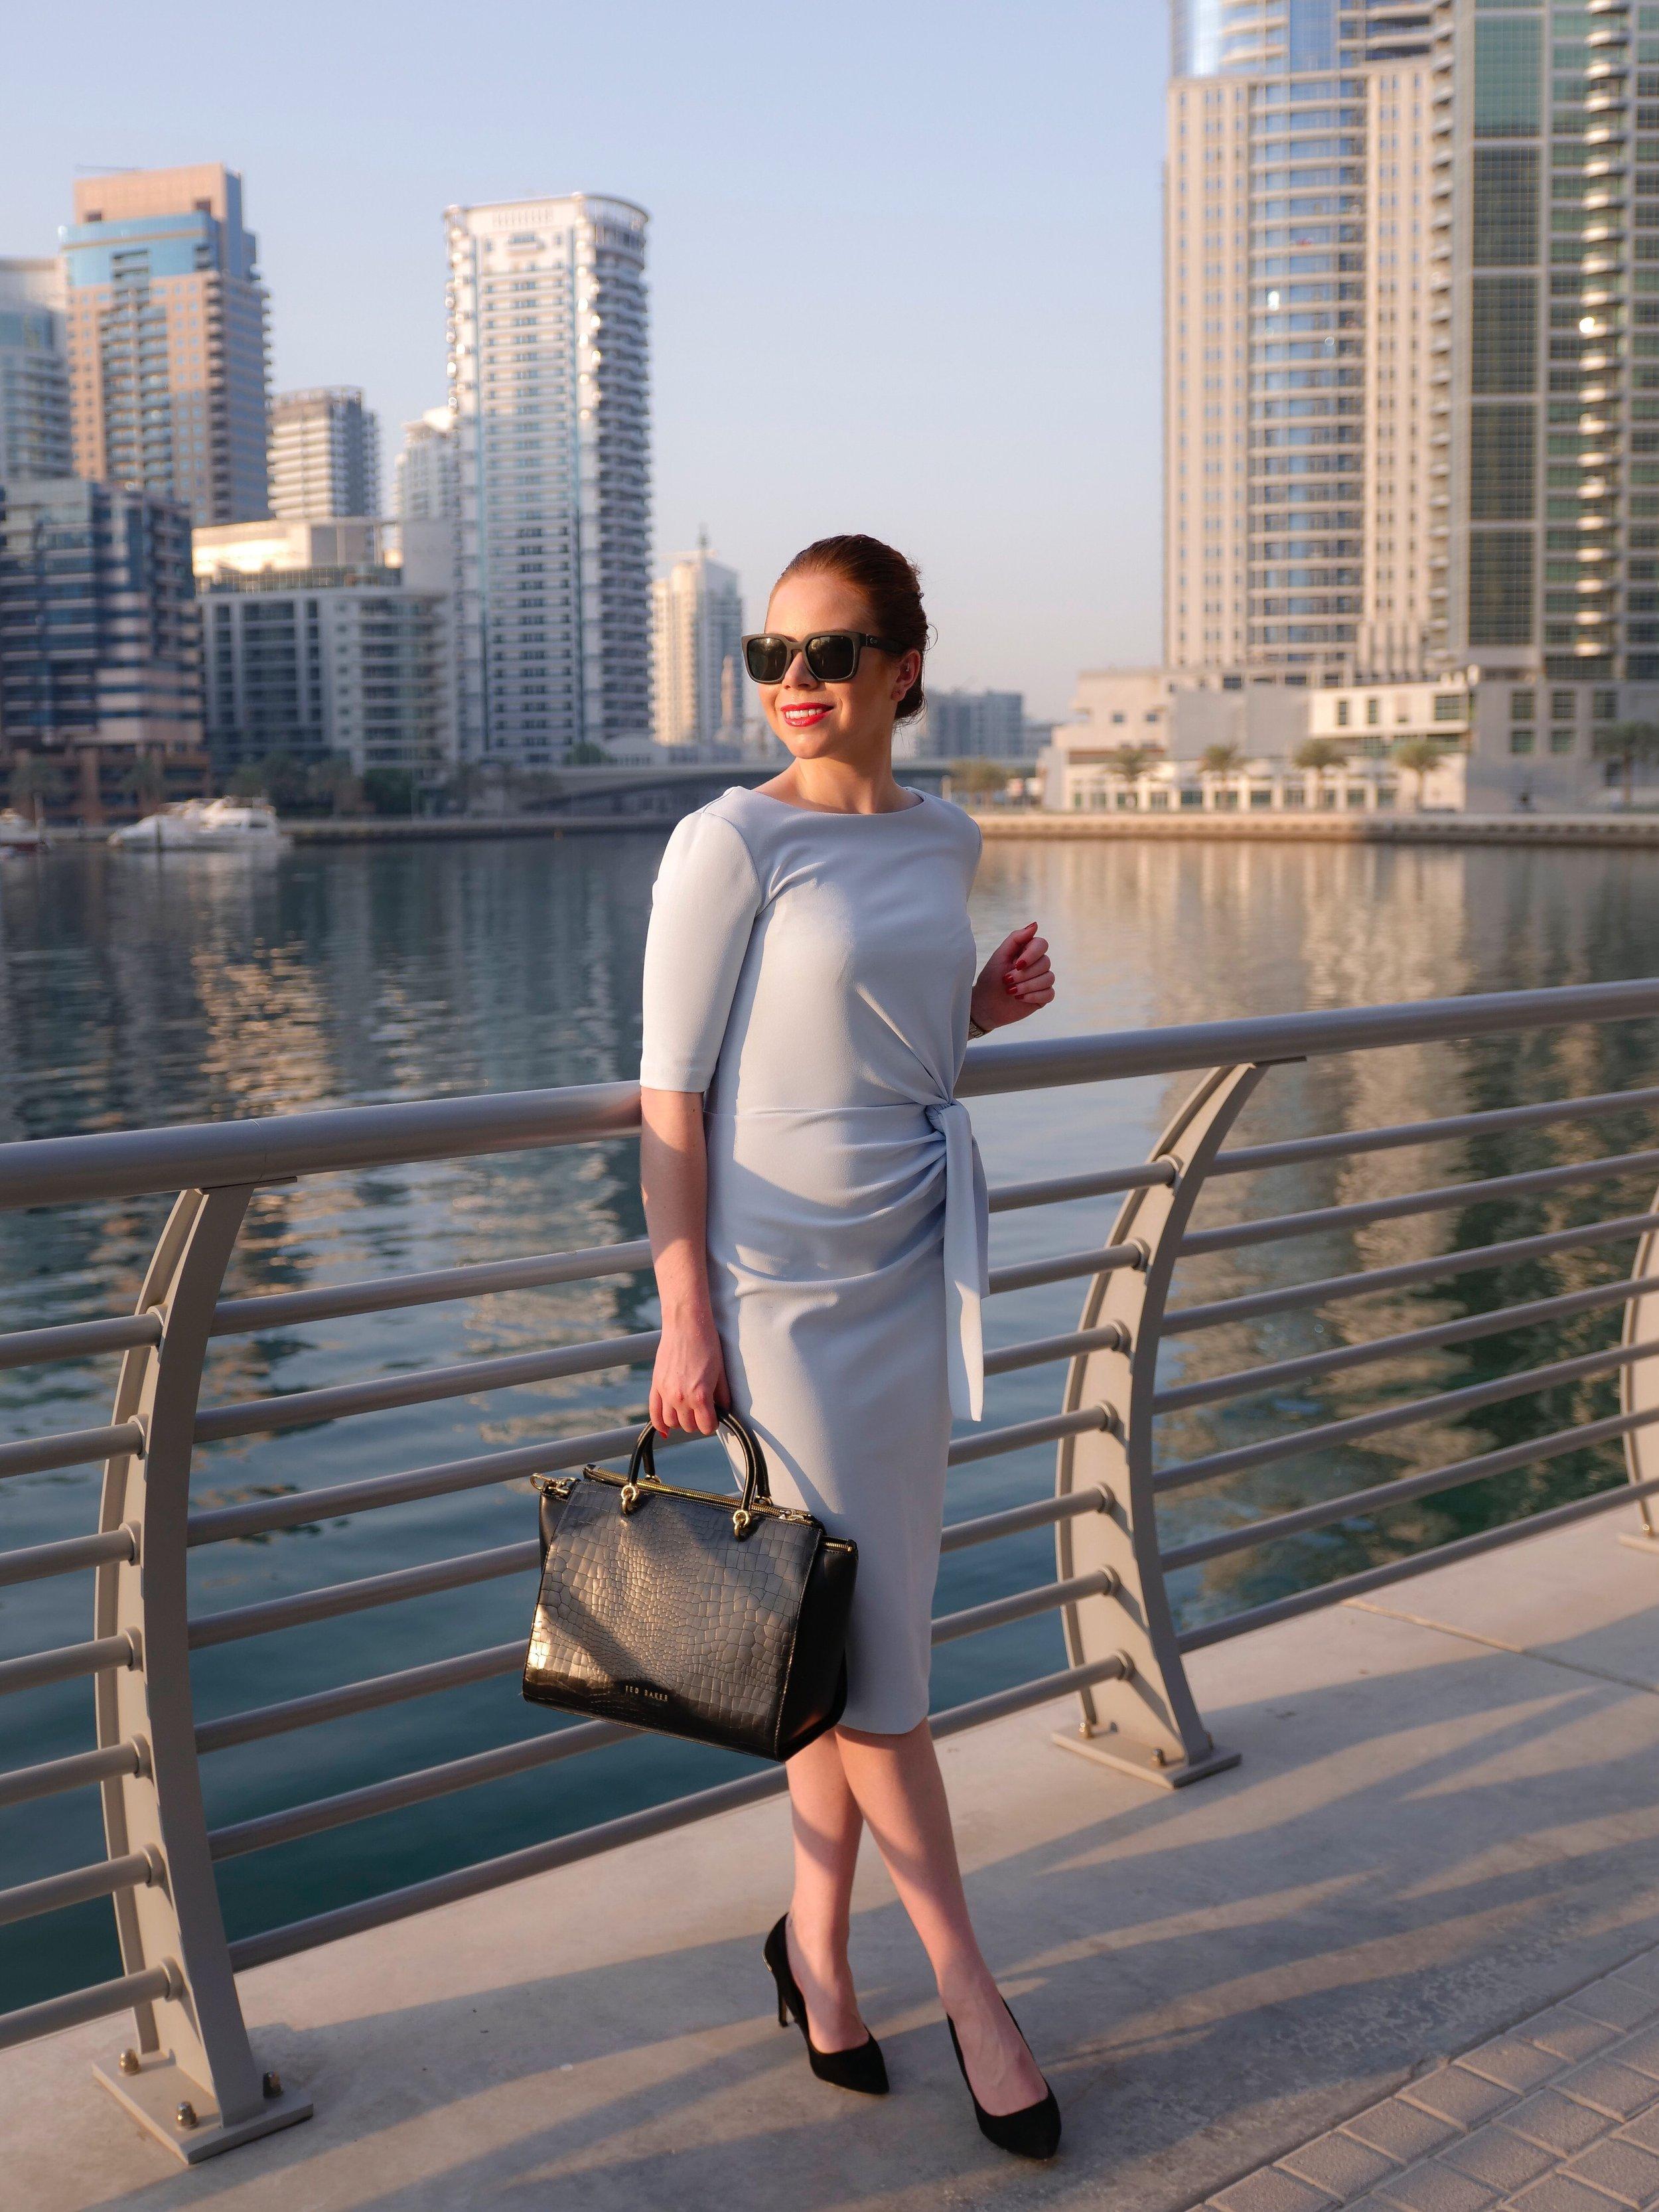 Deals in High Heels - Blue Dress, Black Sunglasses